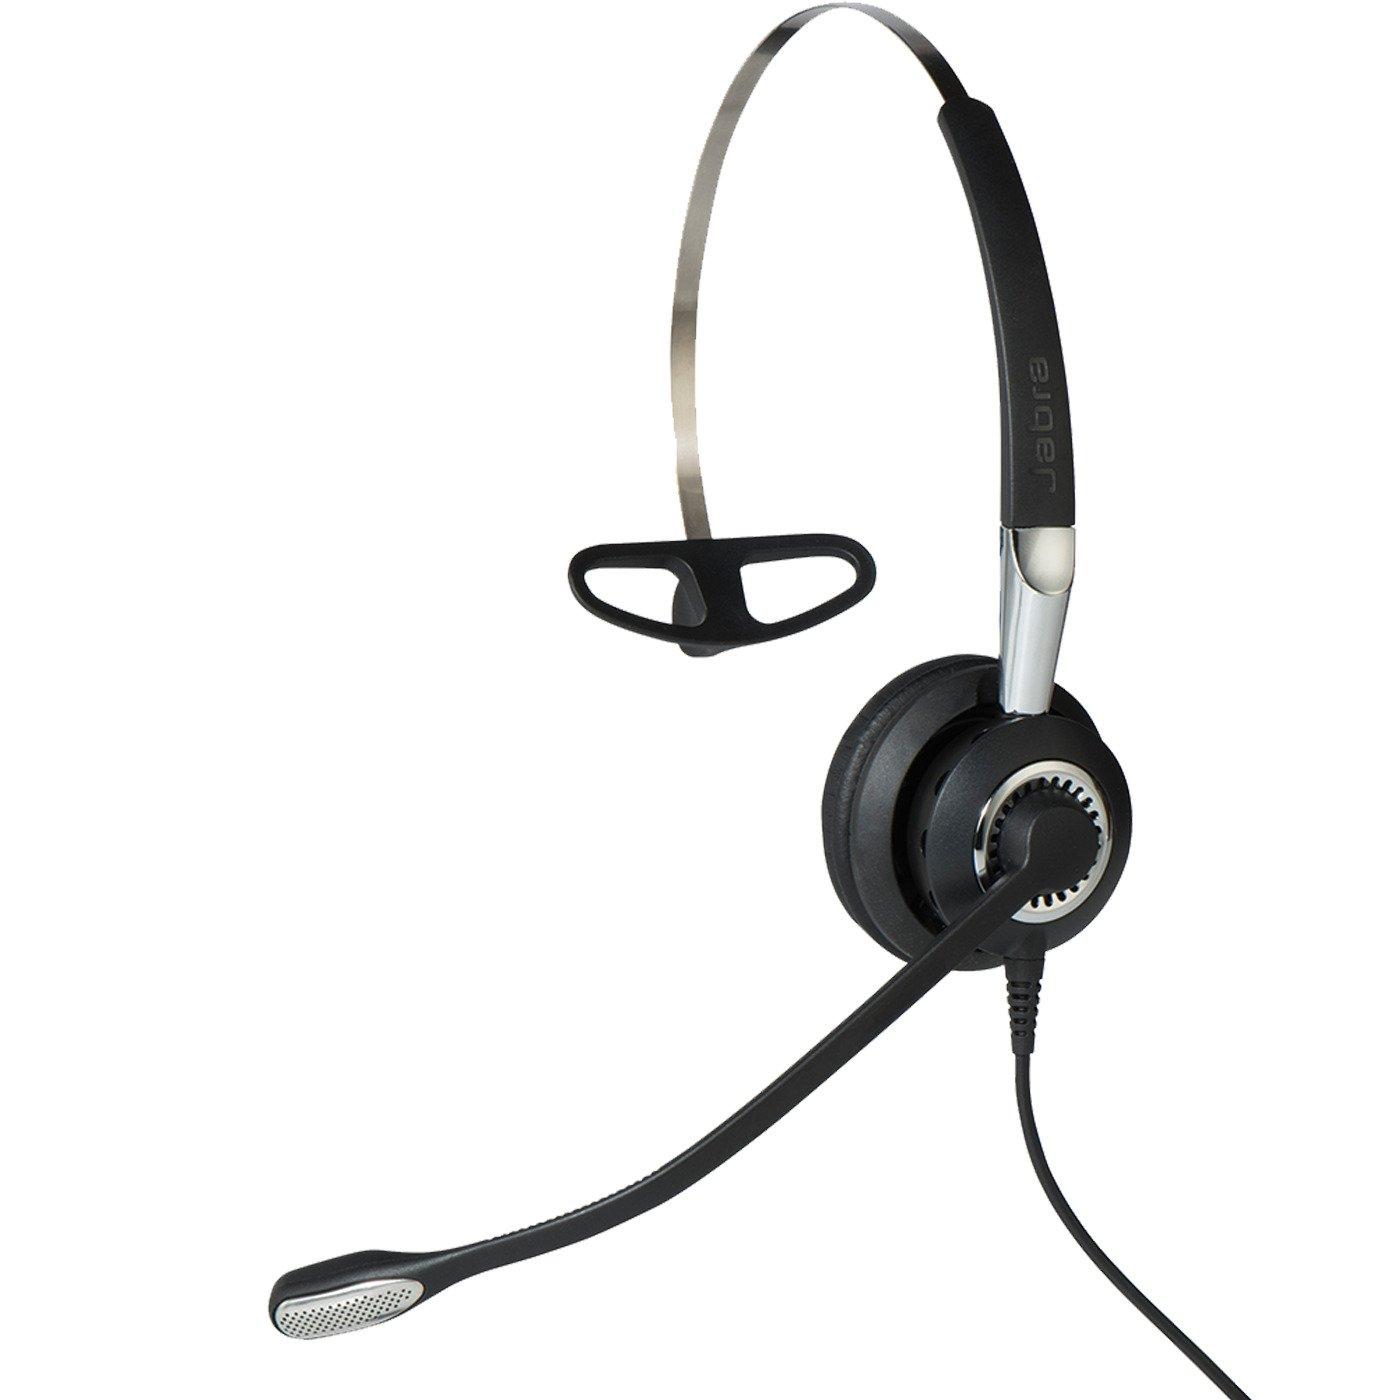 Jabra 2400 II QD Mono UNC 3-in-1 Wired Headset - Black by Jabra